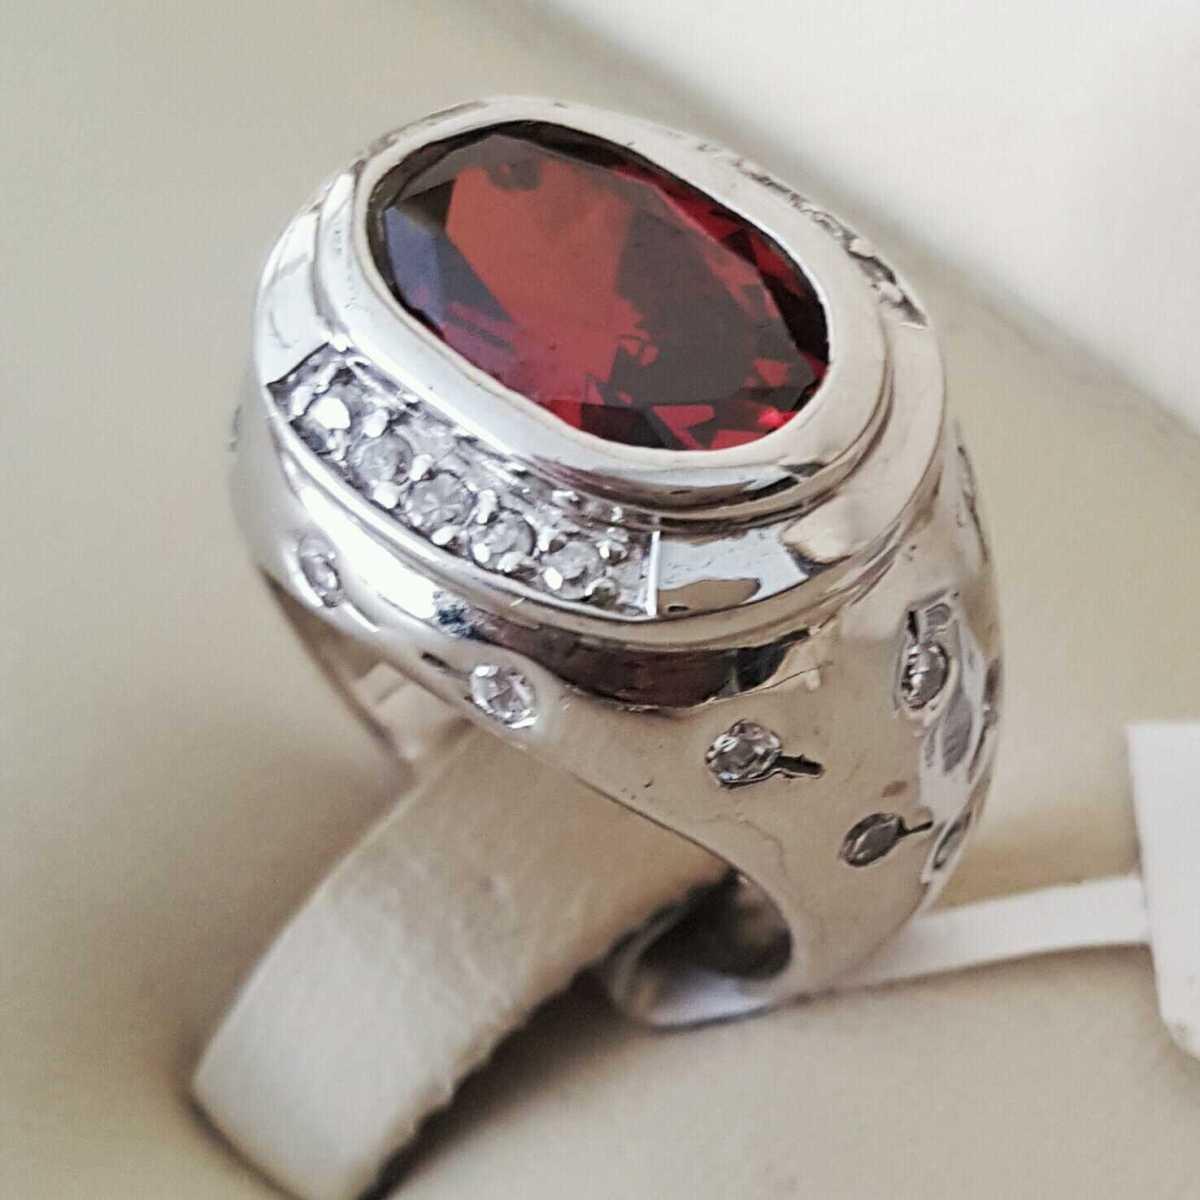 Real Silver 925 Jewellery Buy in Pakistan 33 natural gemstones pakistan + 925 silver jewelry online